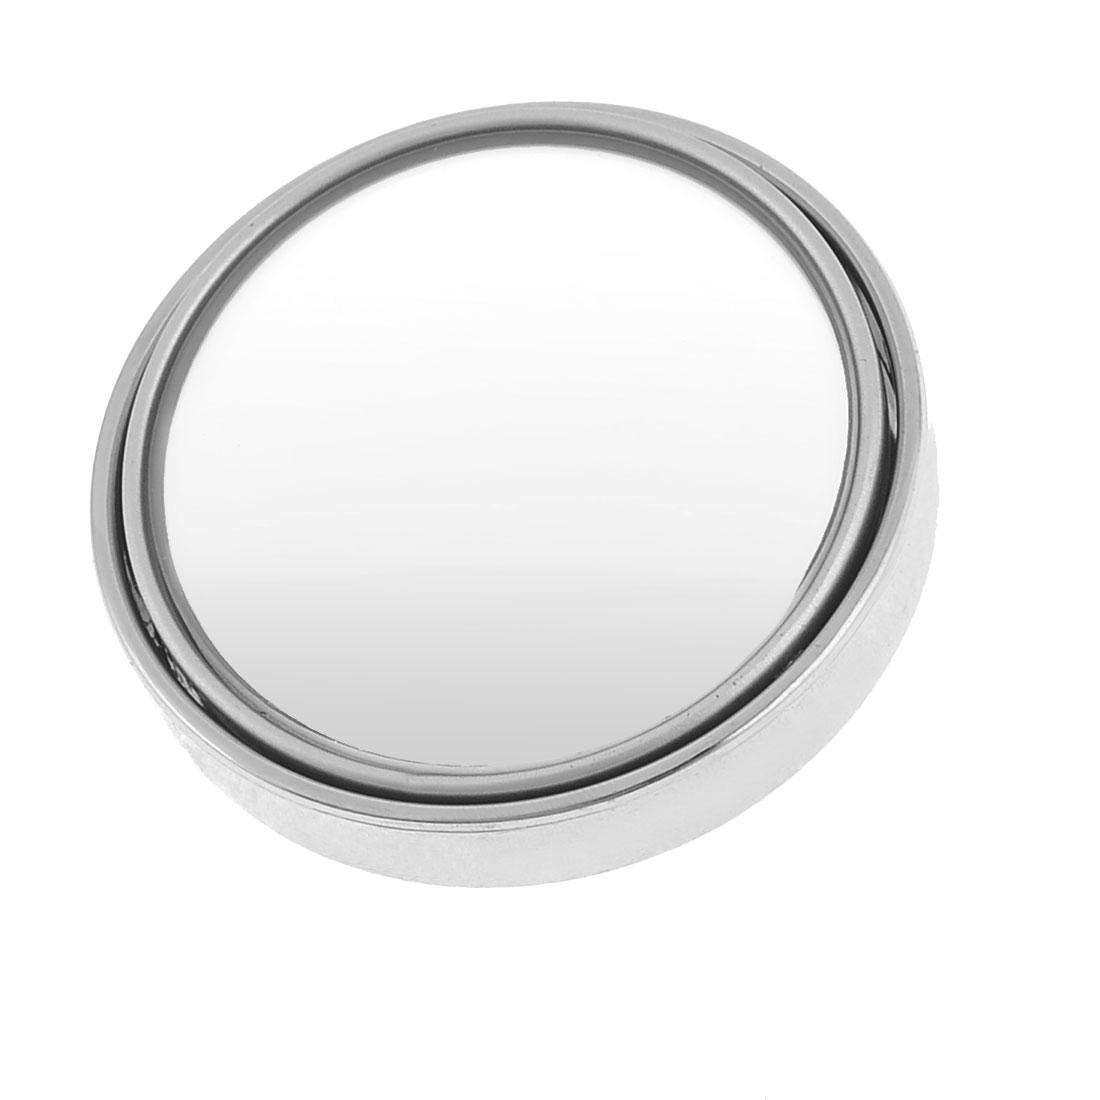 "Universal Car 2"" Dia Round Wide Angle Convex Blind Spot Mirror Silver Tone"